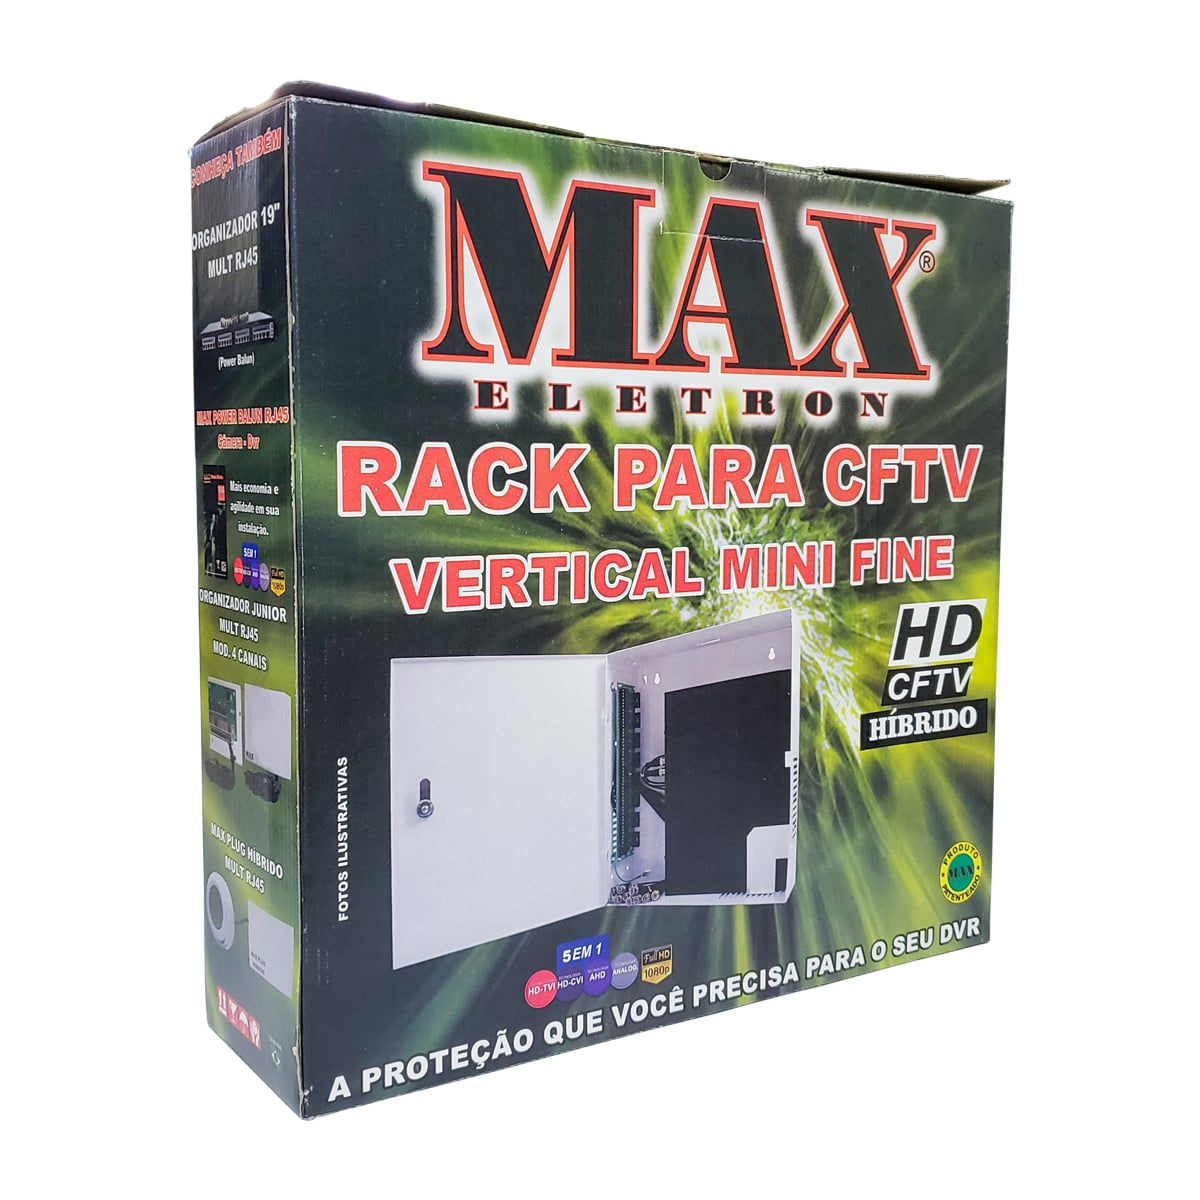 Rack Vertical Fine c/ Placa Eletrônica 4 Canais Max Eletron  - CFTV Clube | Brasil